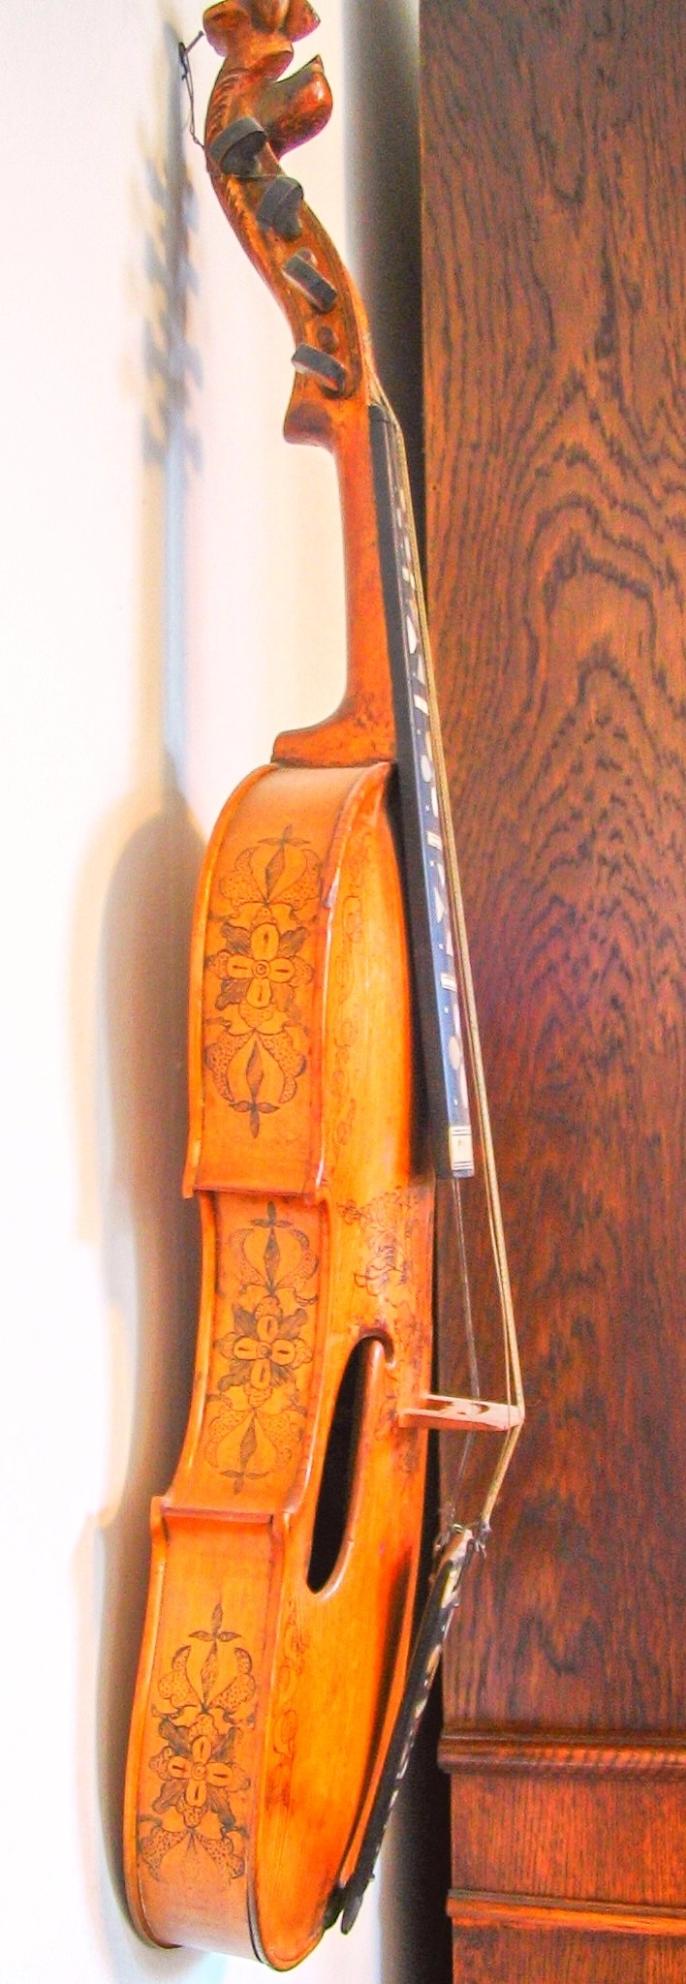 The Most Popular Violin Types - Hardanger fiddle - side view - Copenhagen - Jerry